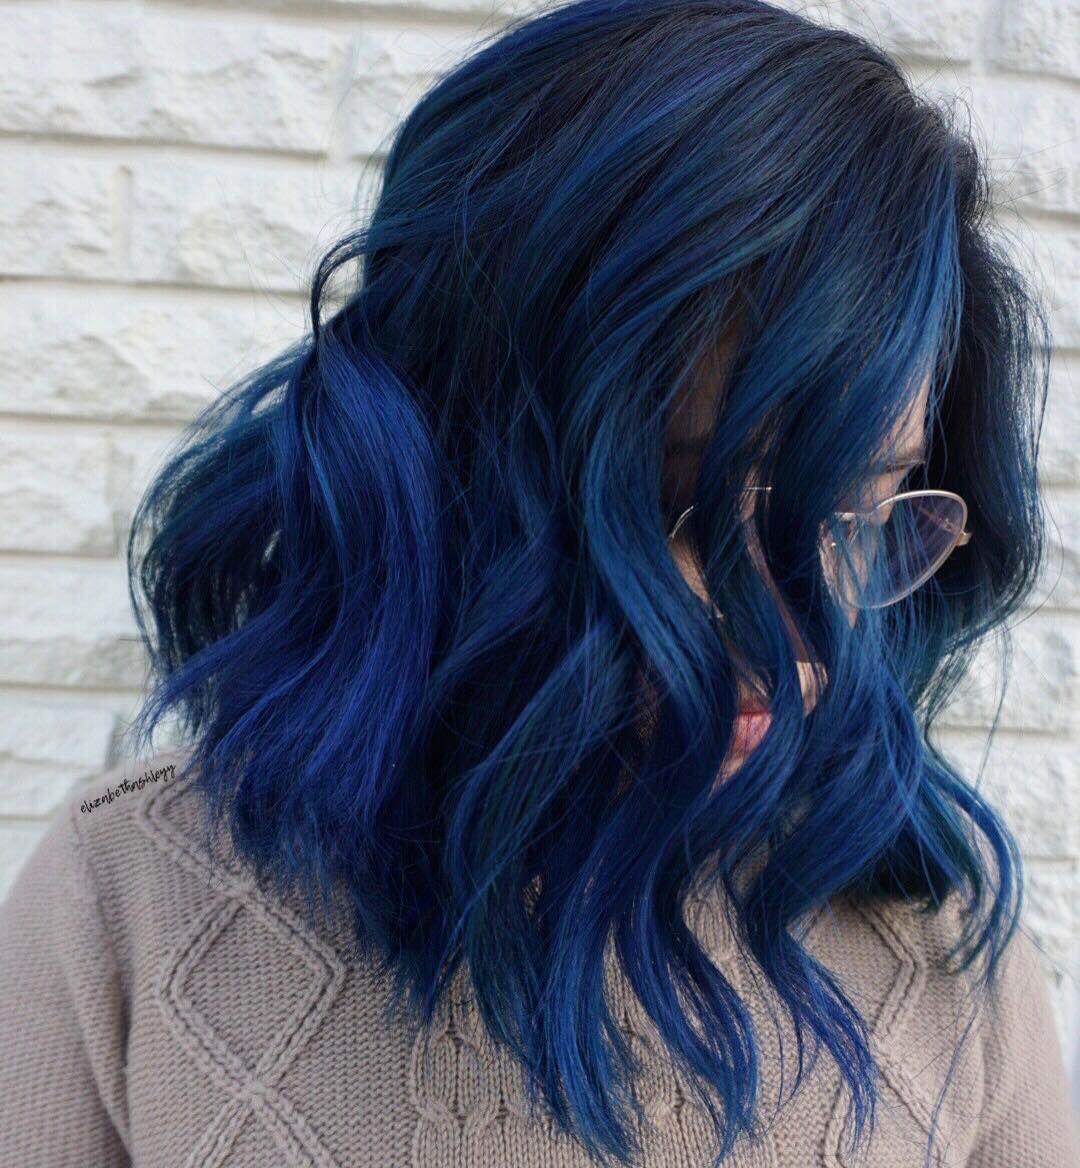 Liz Hair Baltimore On Instagram Blue Dream Balayaged